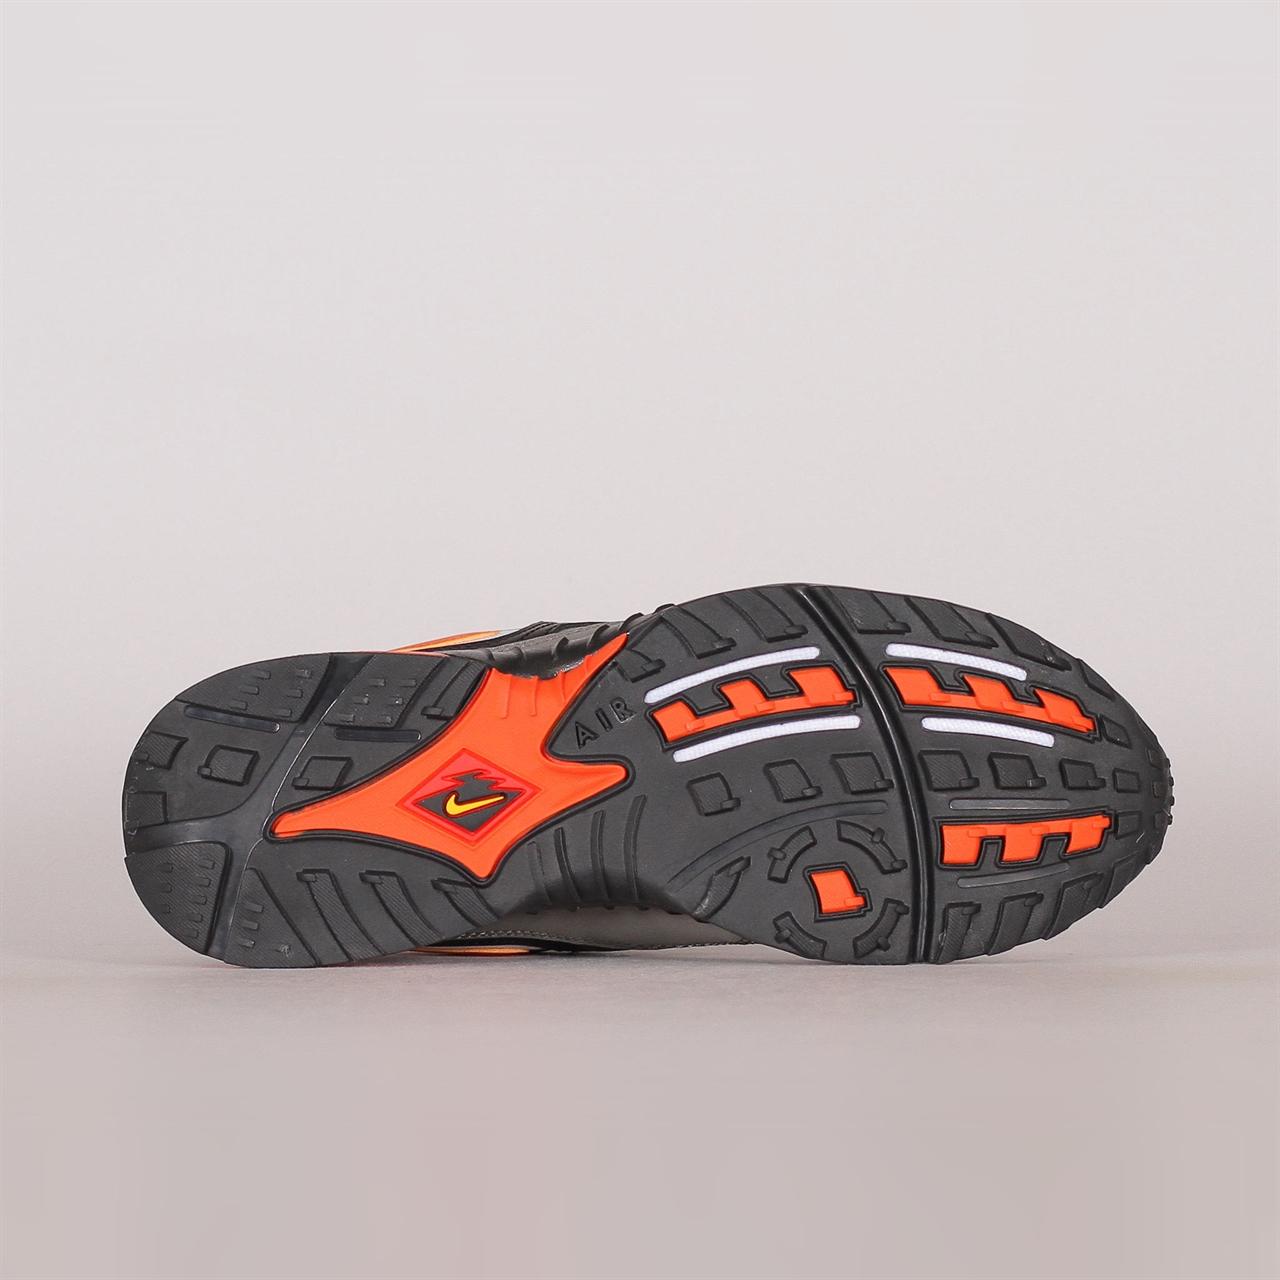 Shelta Nike Air Terra Humara 18 (AO1545 003)